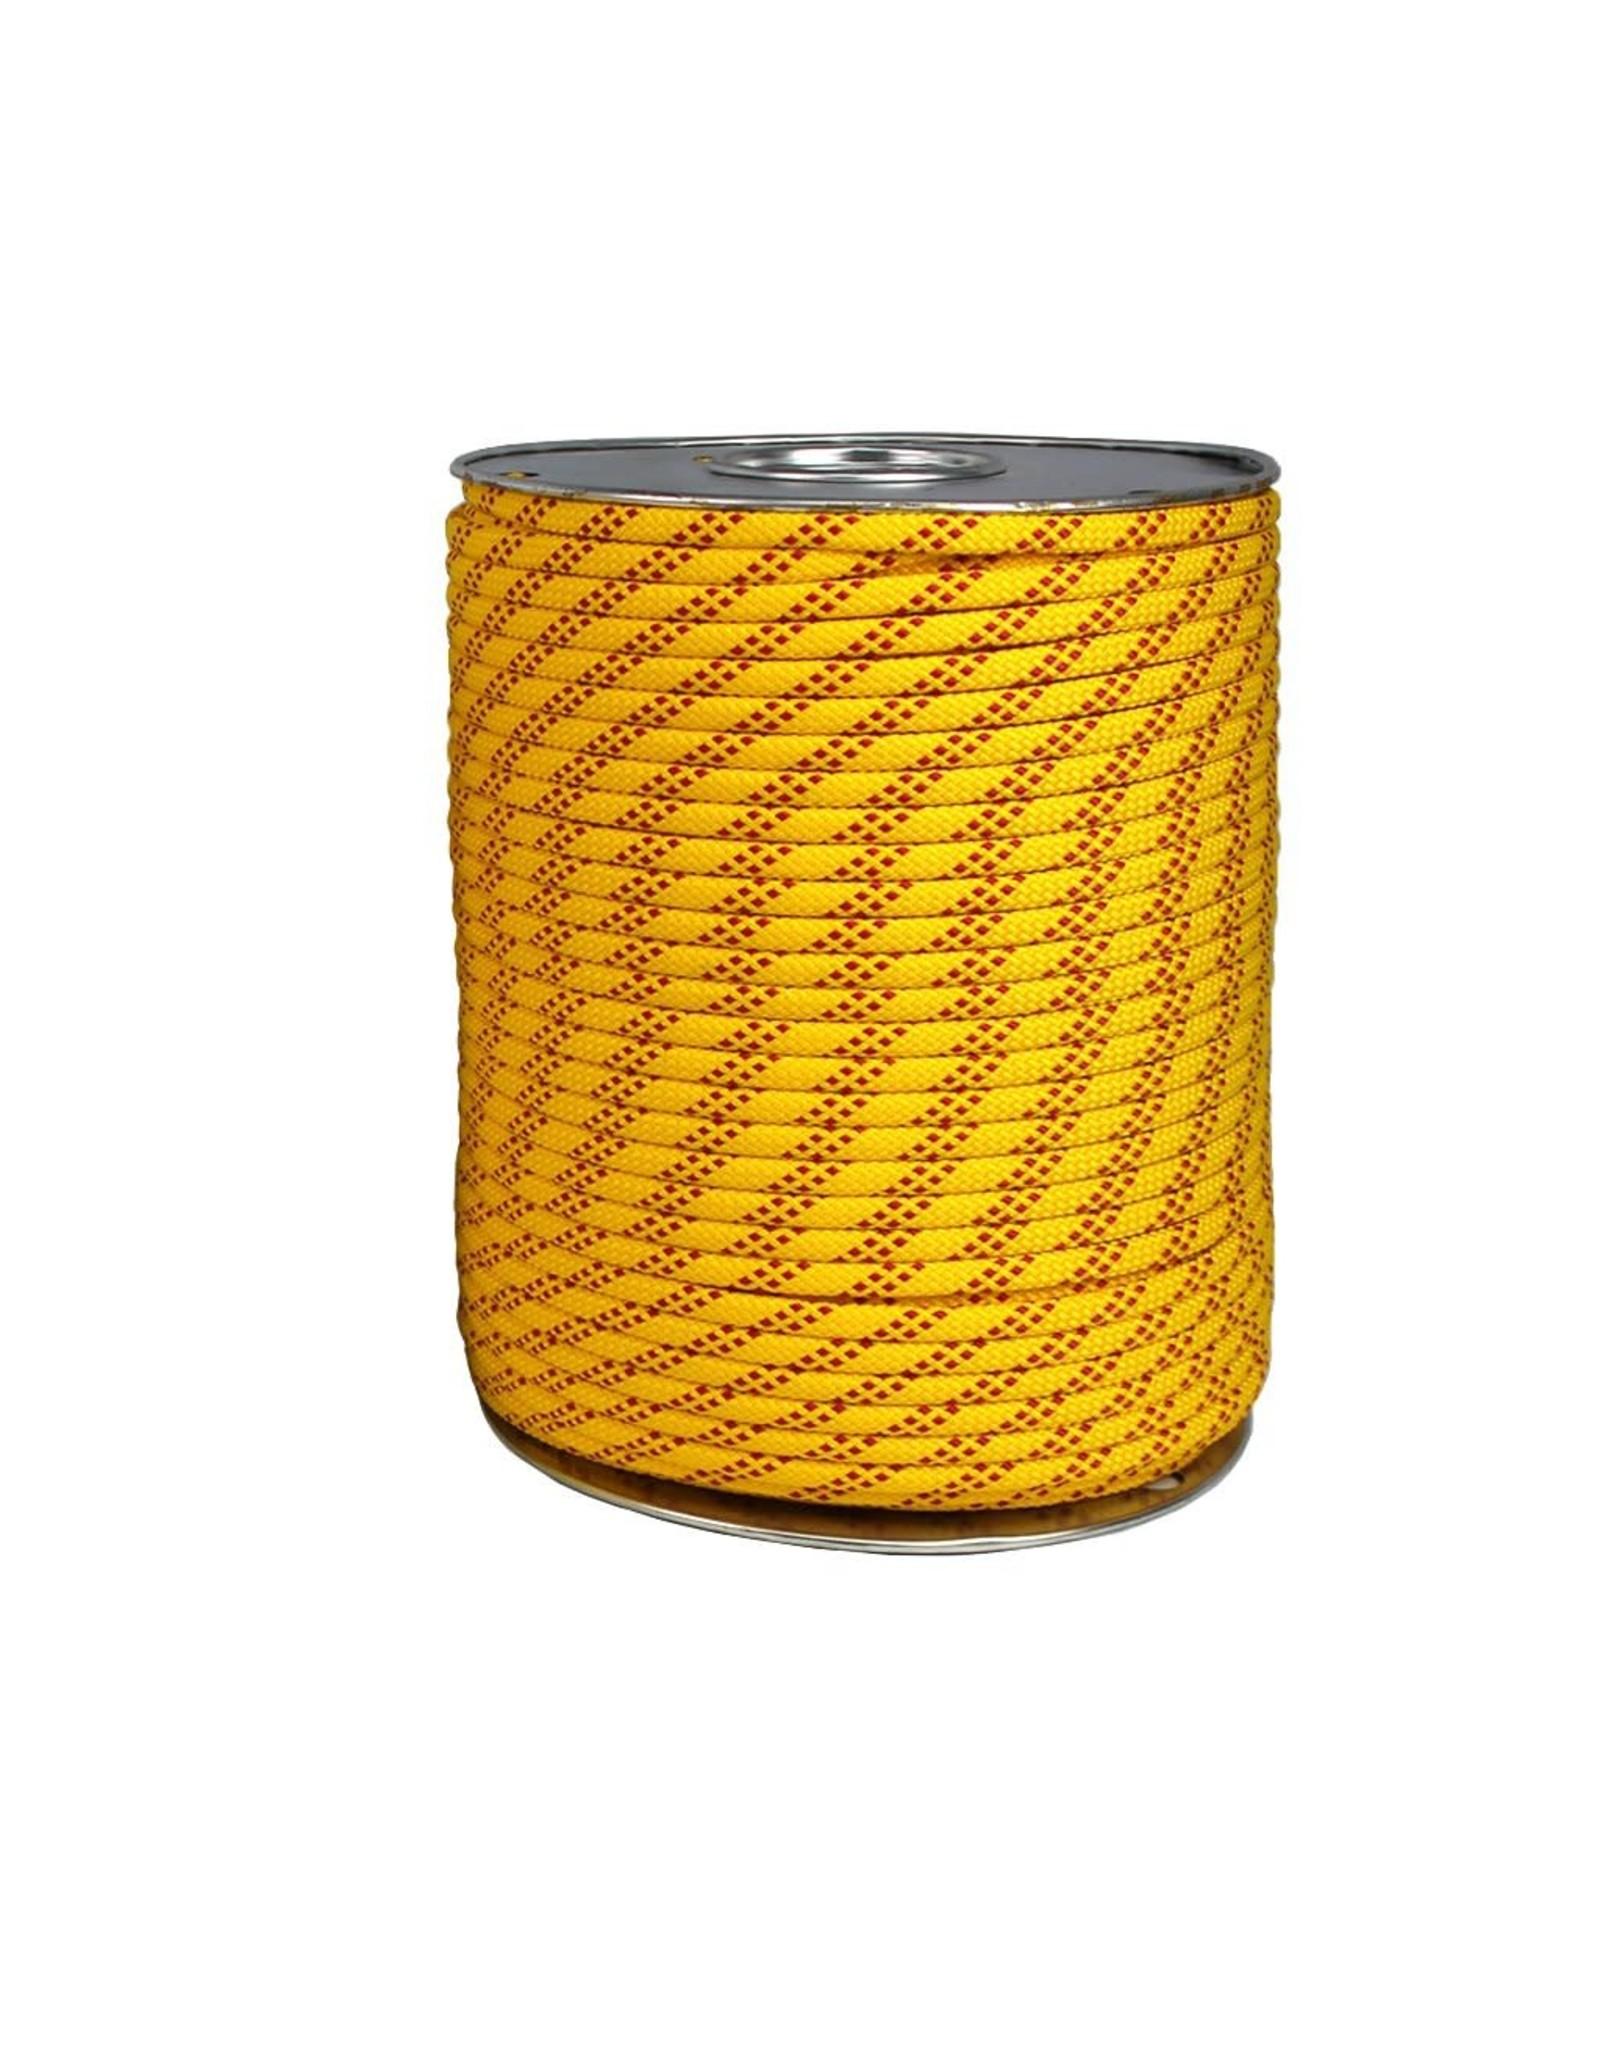 Atlan Atlan floating rope 7.9 mm - sold by feets